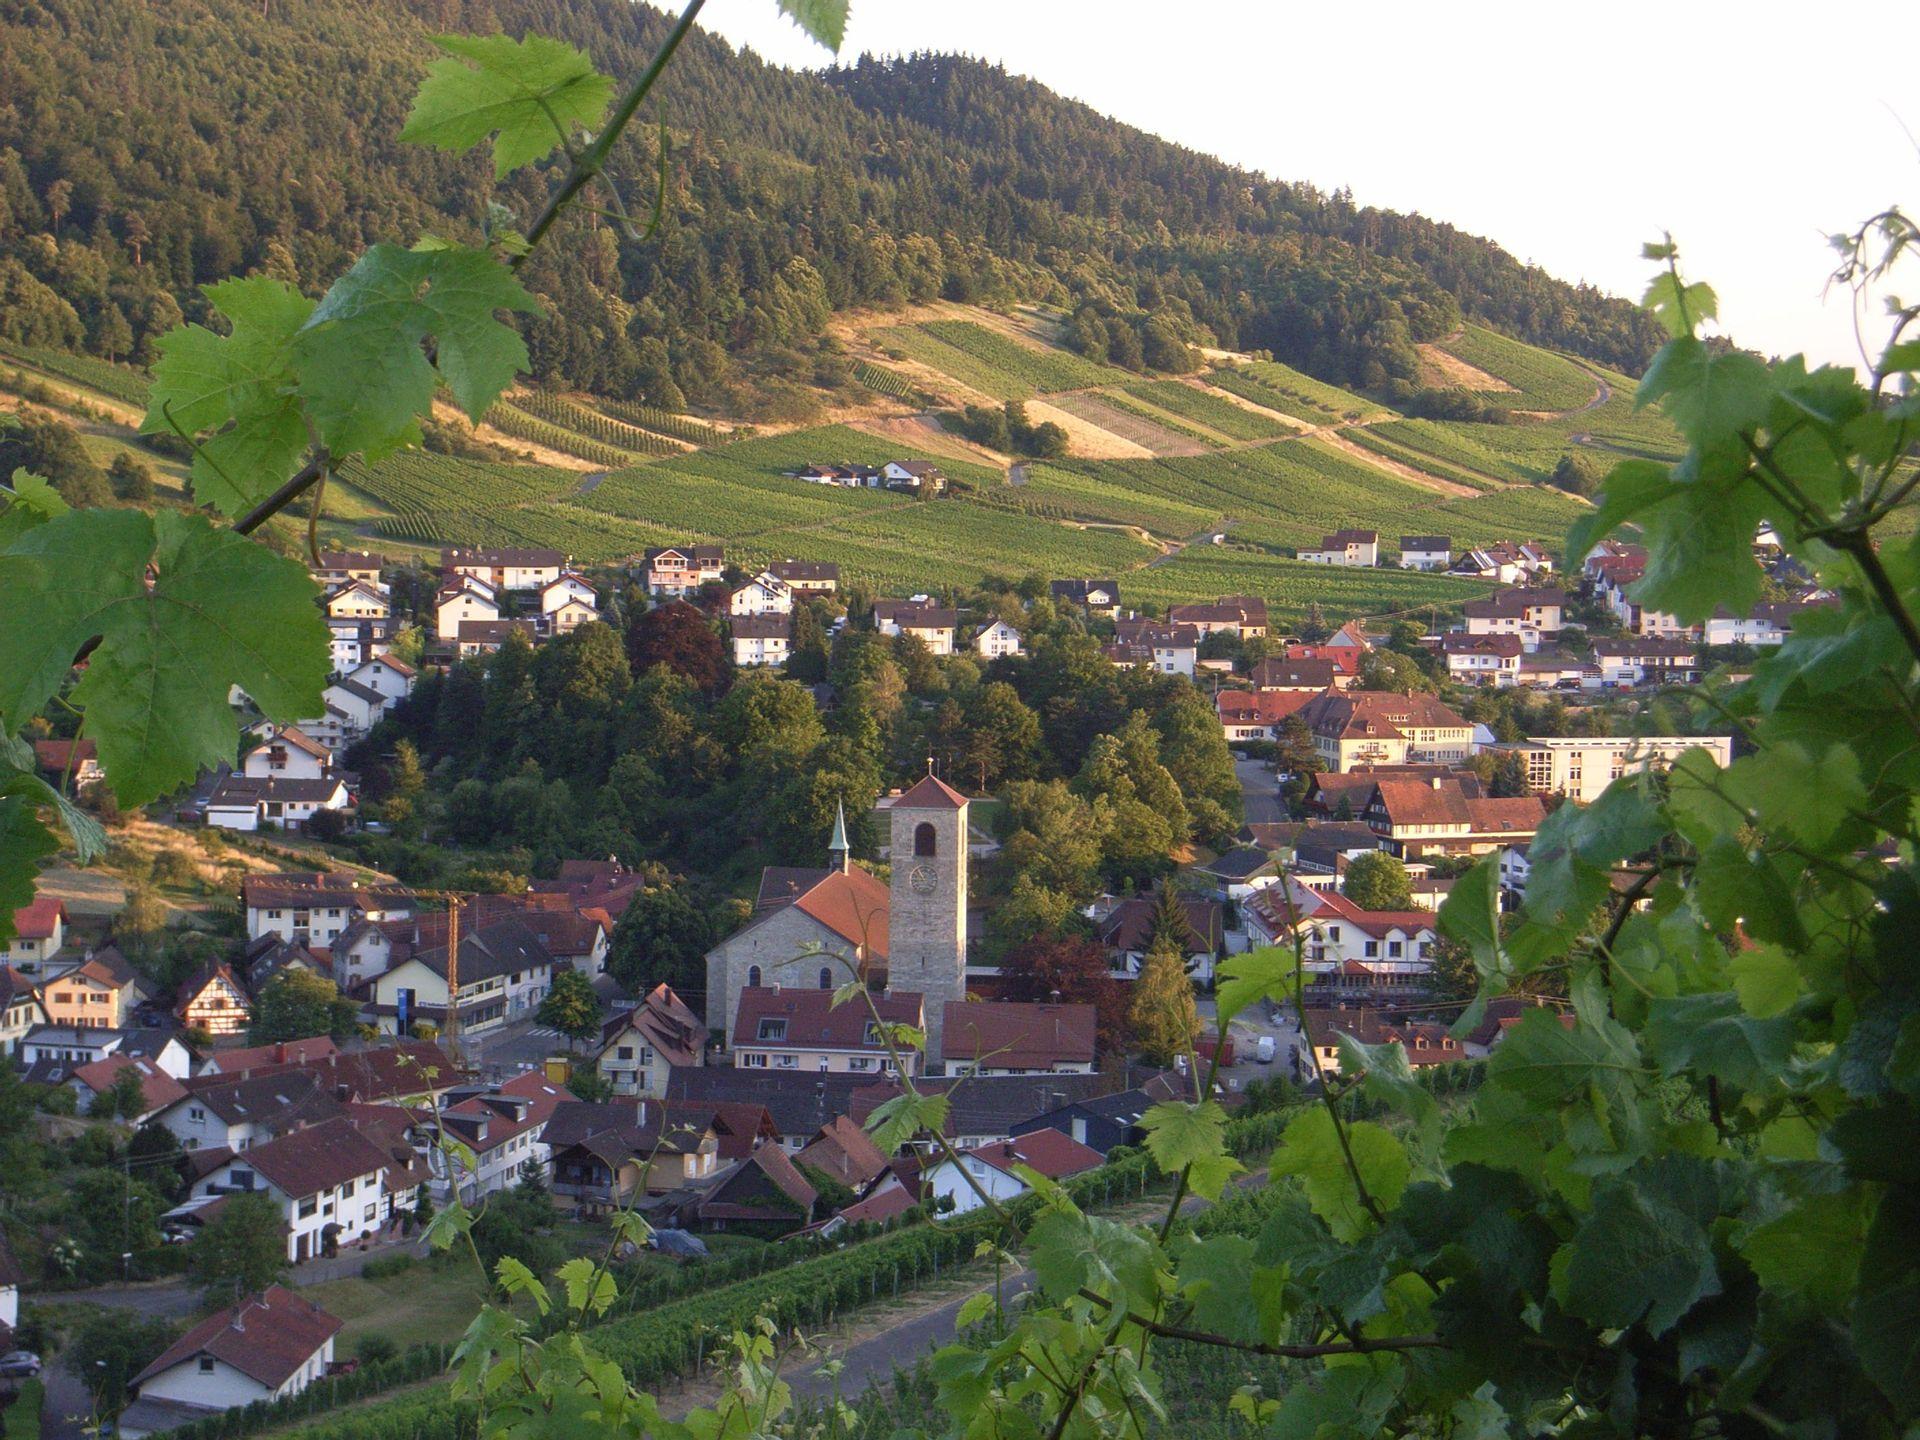 Orts - Geschichte des Baden-Badener Reblandes -